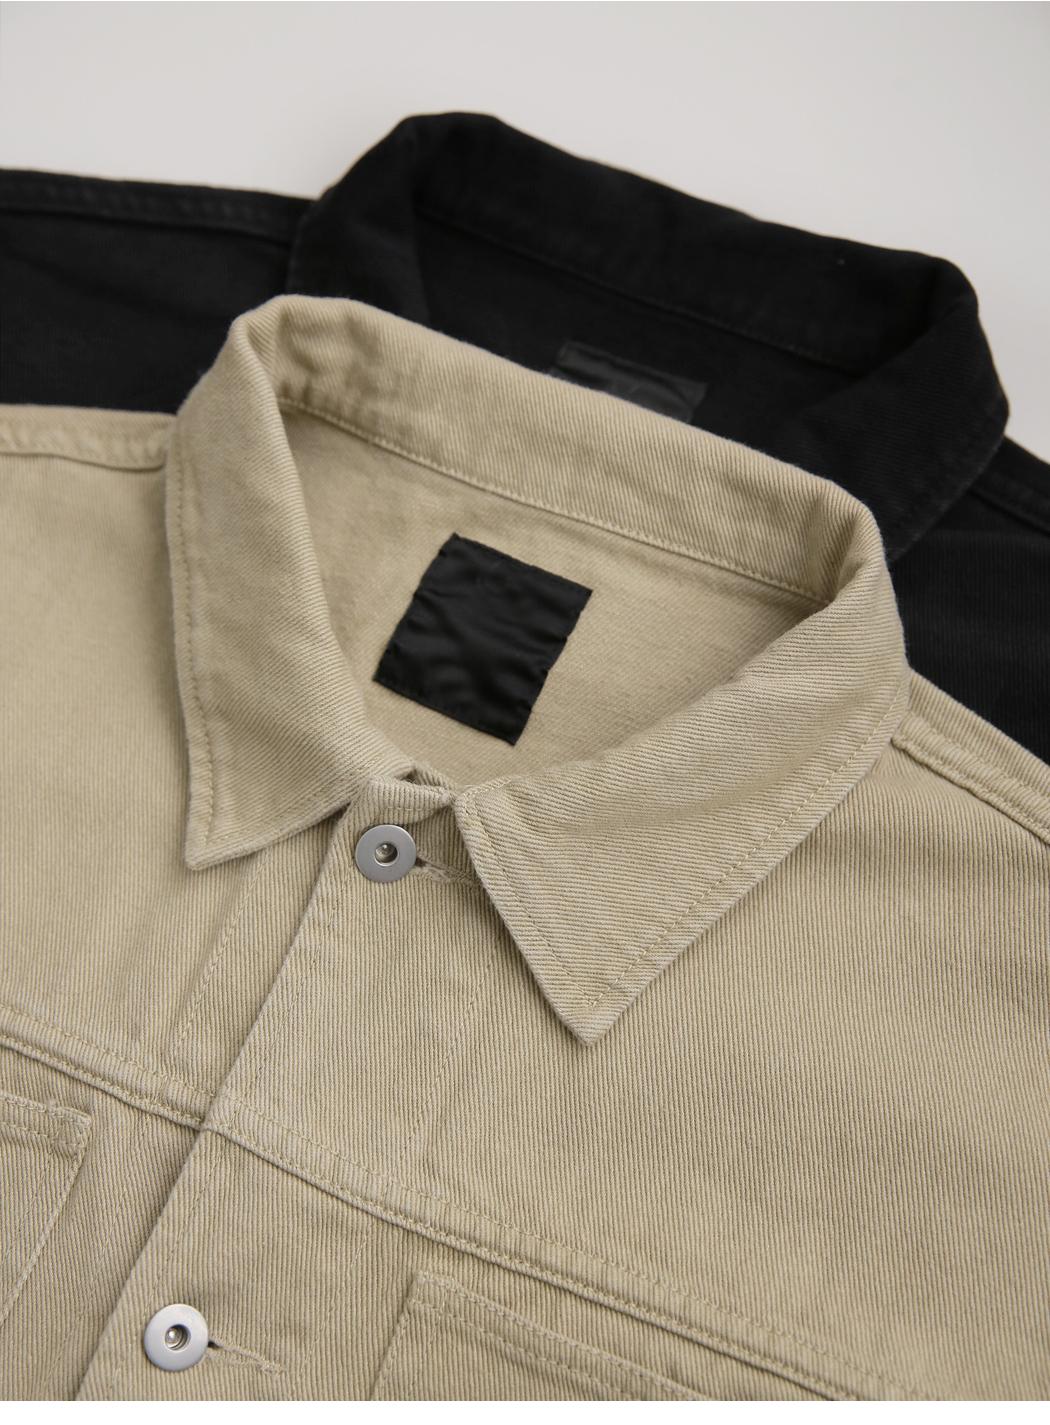 《Planned Product》 Neutral Denim Trucker Jacket